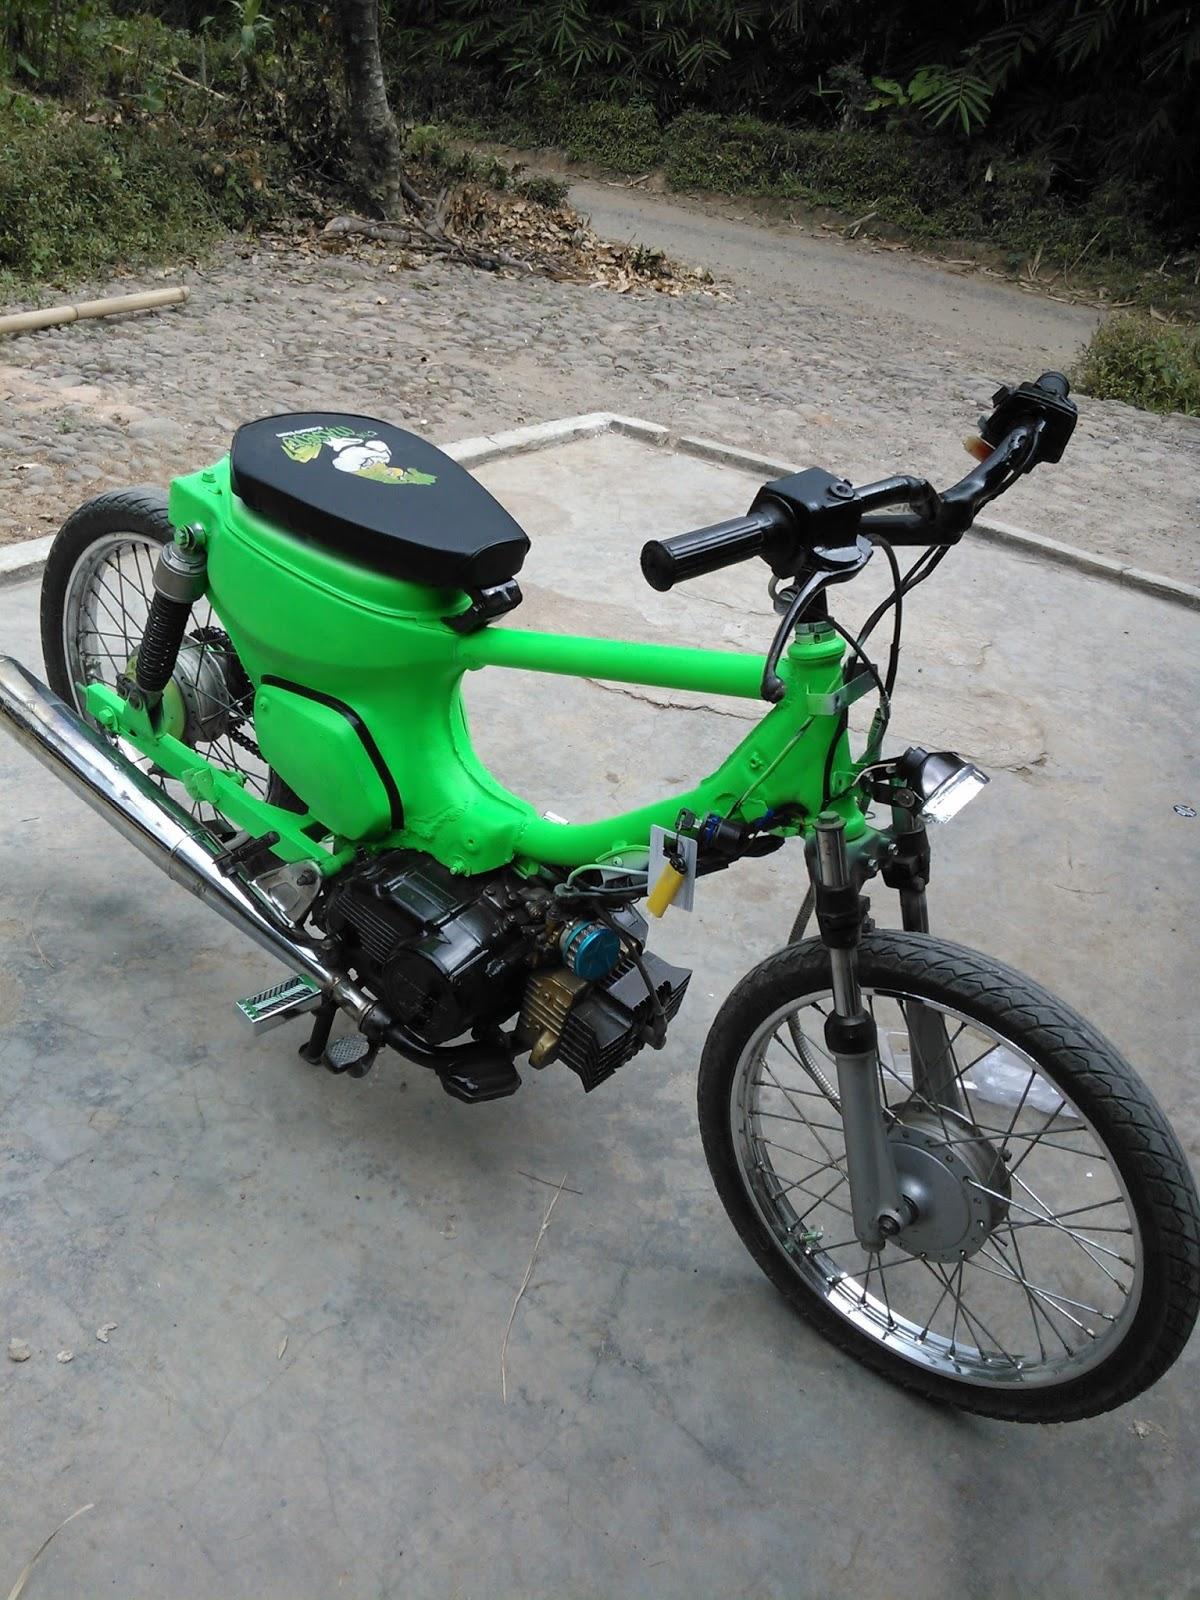 Gambar Modifikasi Motor Suzuki Bravo Wacana Modif Motor